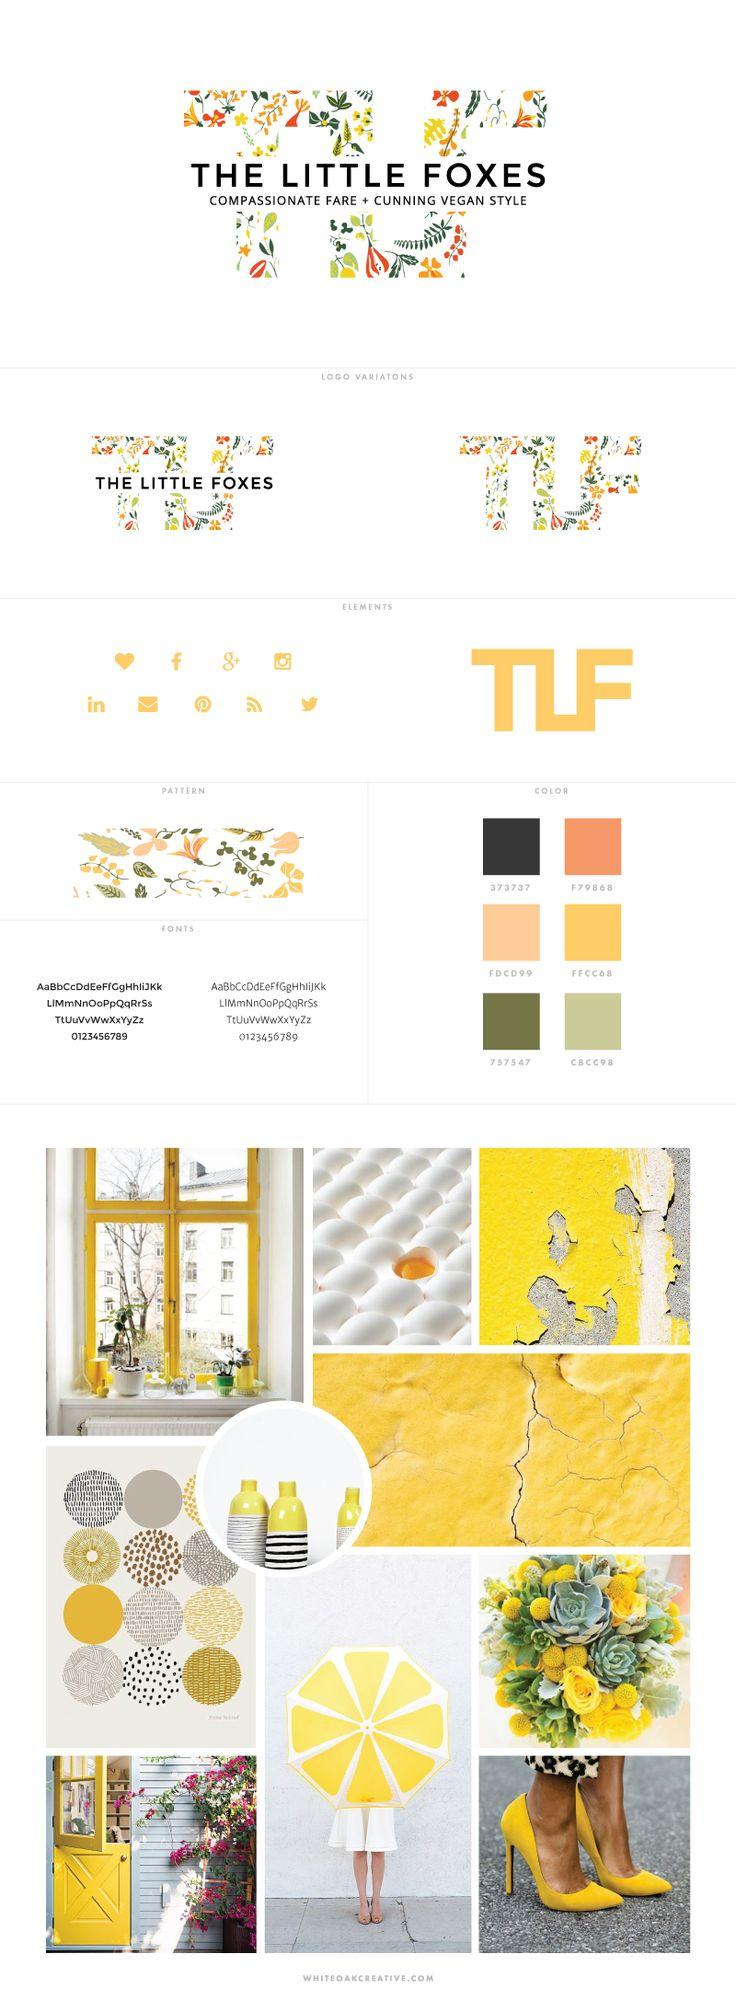 The Little Foxes Blog Design by White Oak Creative - logo design, wordpress theme, mood board inspiration, blog design idea, graphic design, branding